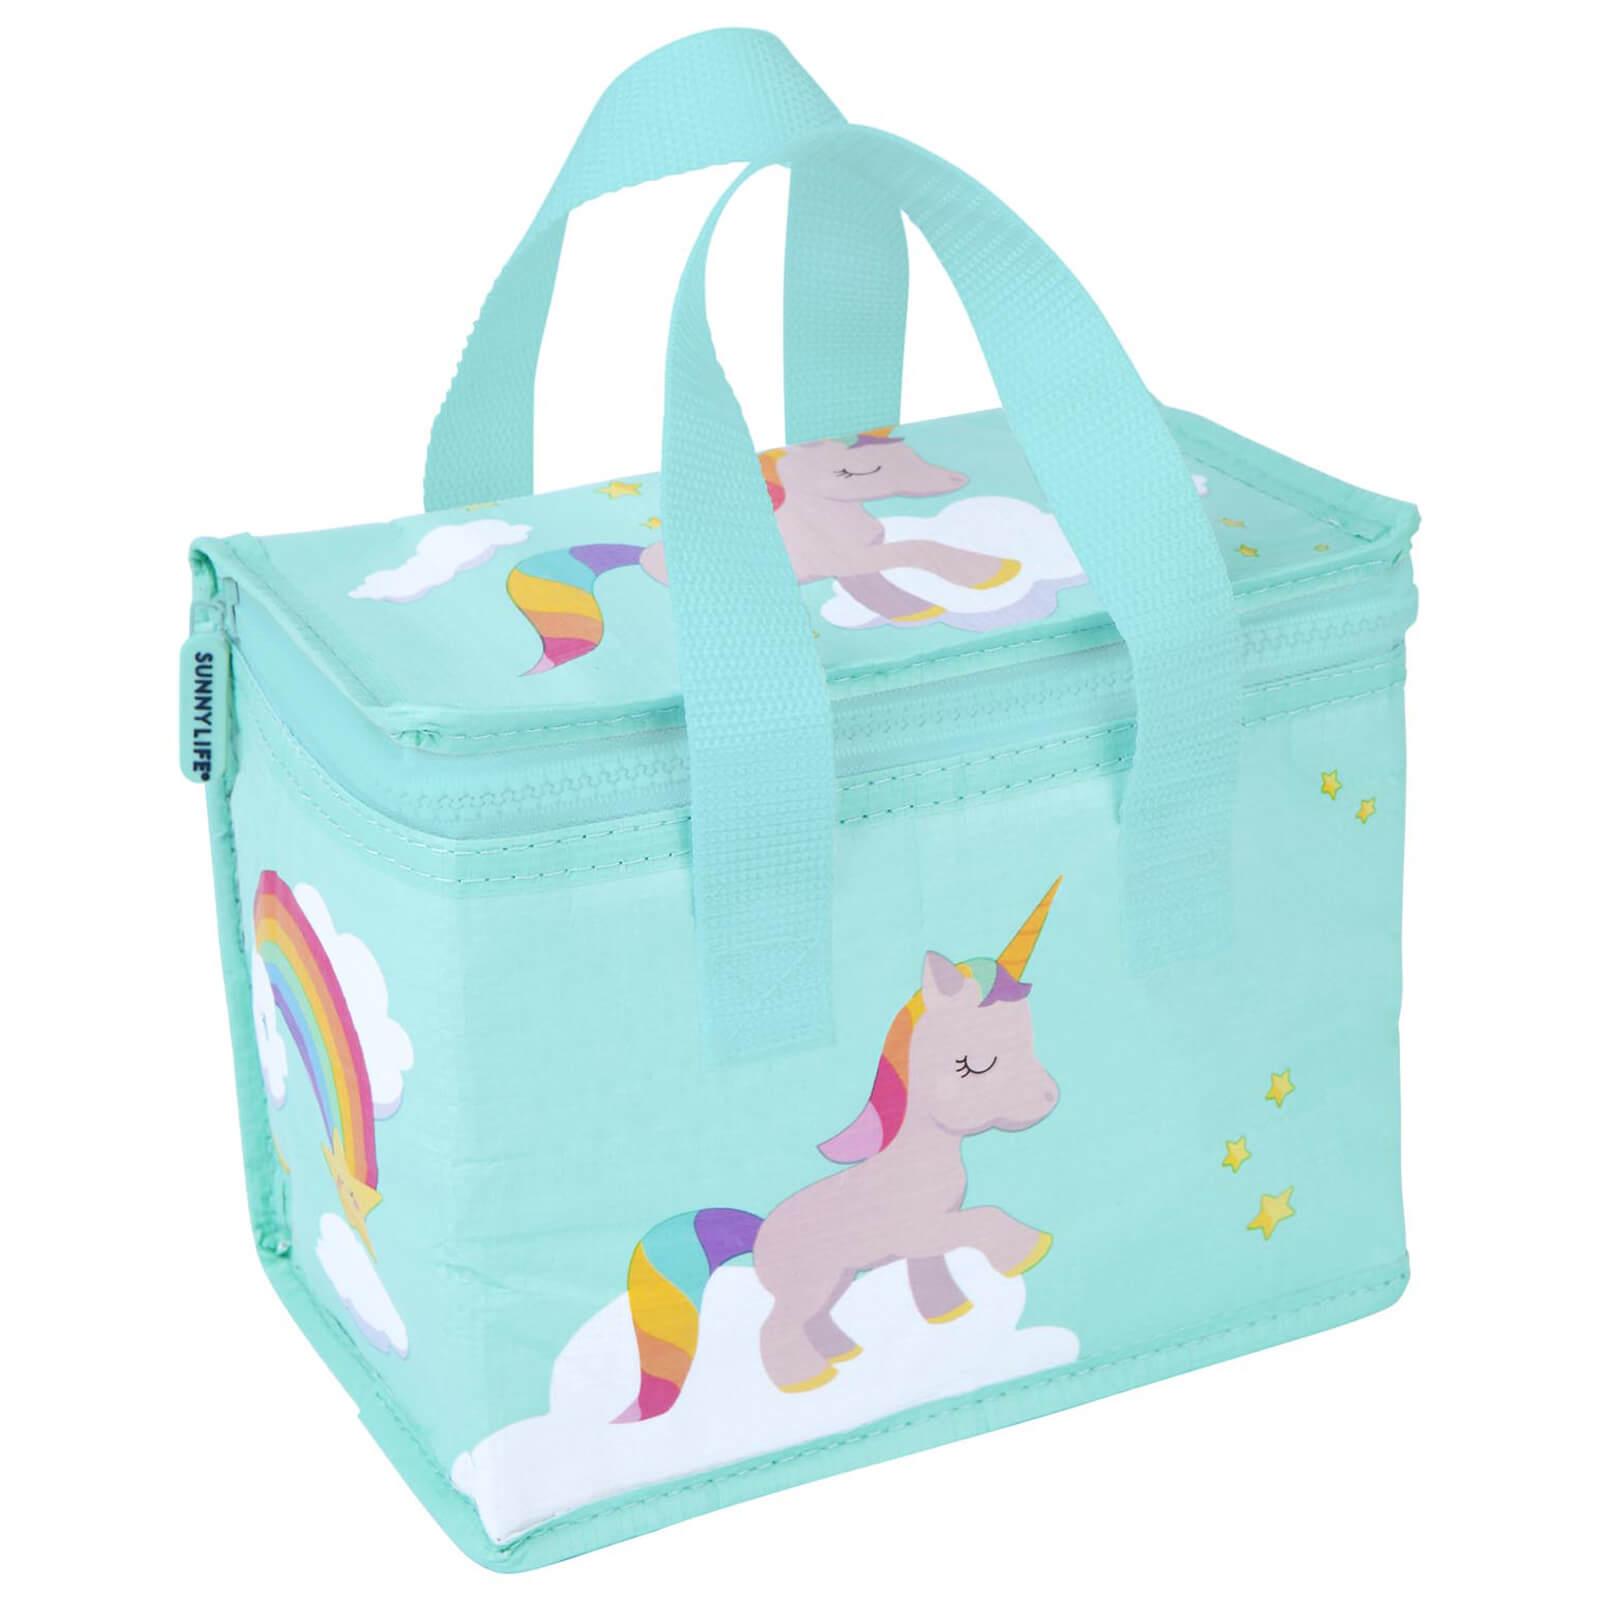 0257386fd6f Sunnylife Unicorn Lunch Tote Bag Womens Accessories | TheHut.com